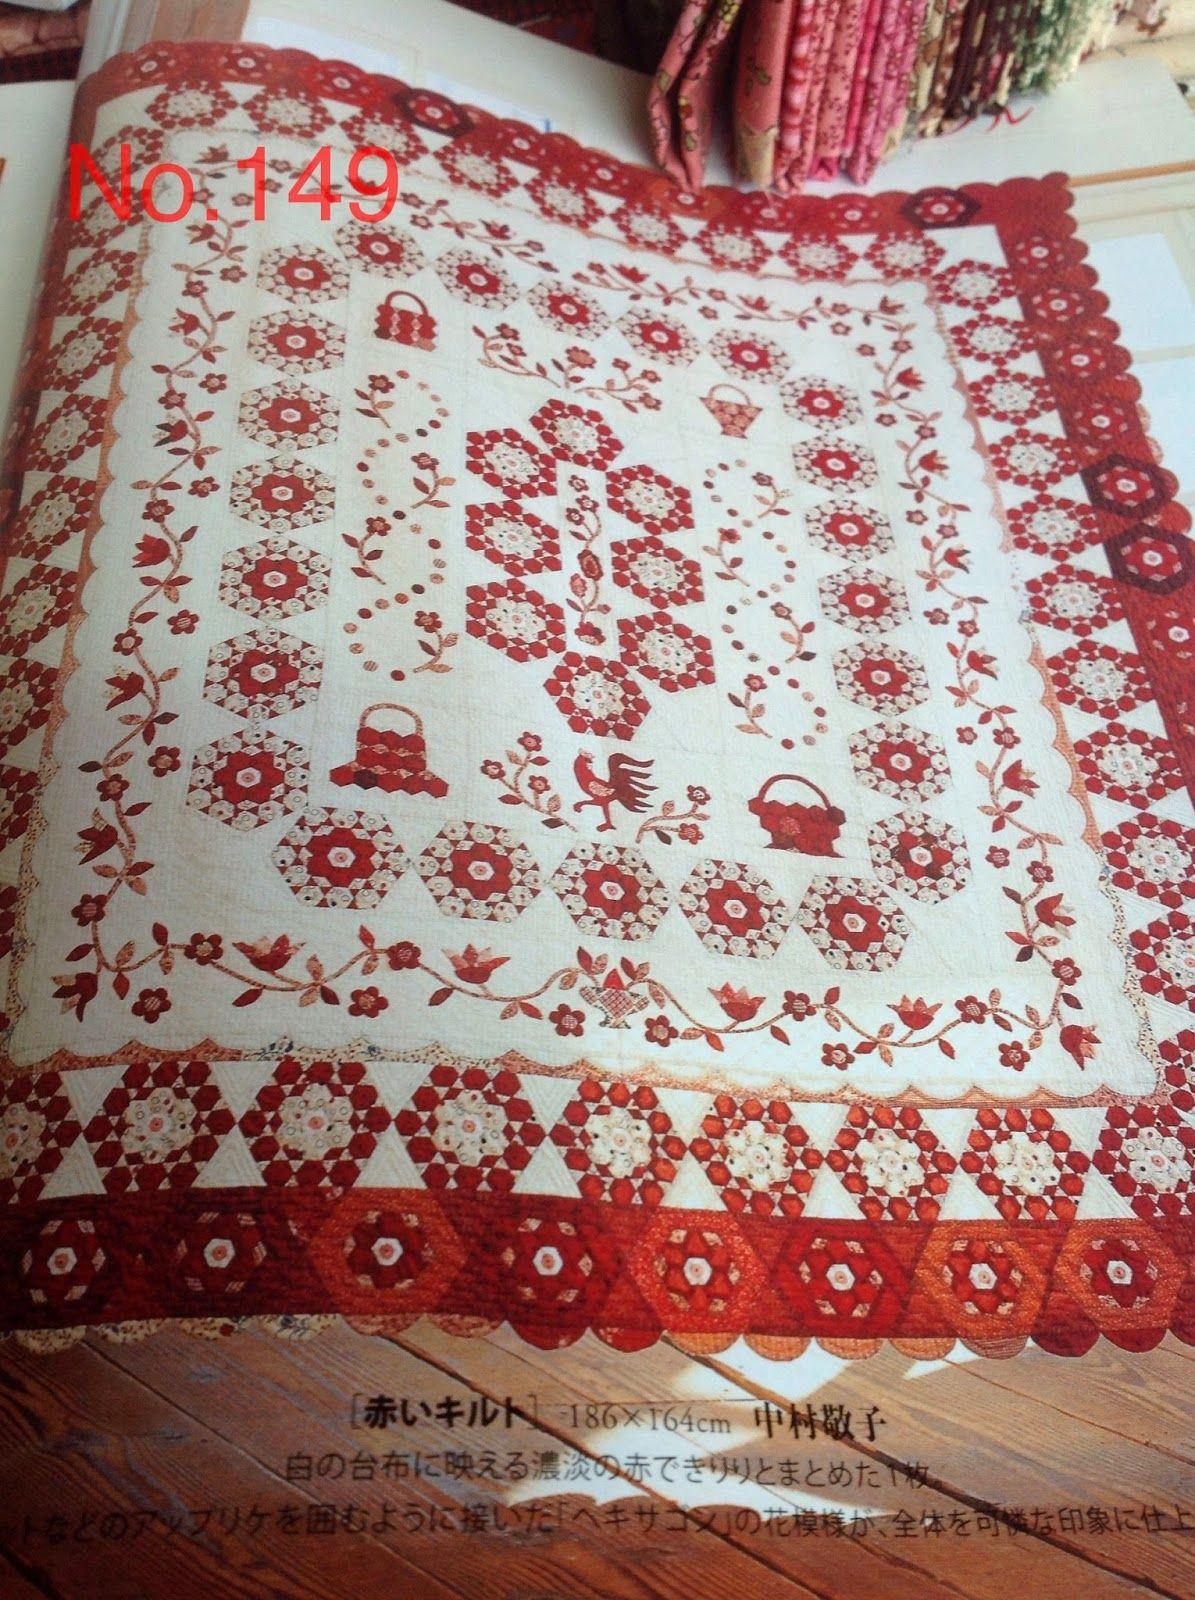 threadbear patchwork quilt reproduction fabric castlemaine australia patchwork. Black Bedroom Furniture Sets. Home Design Ideas